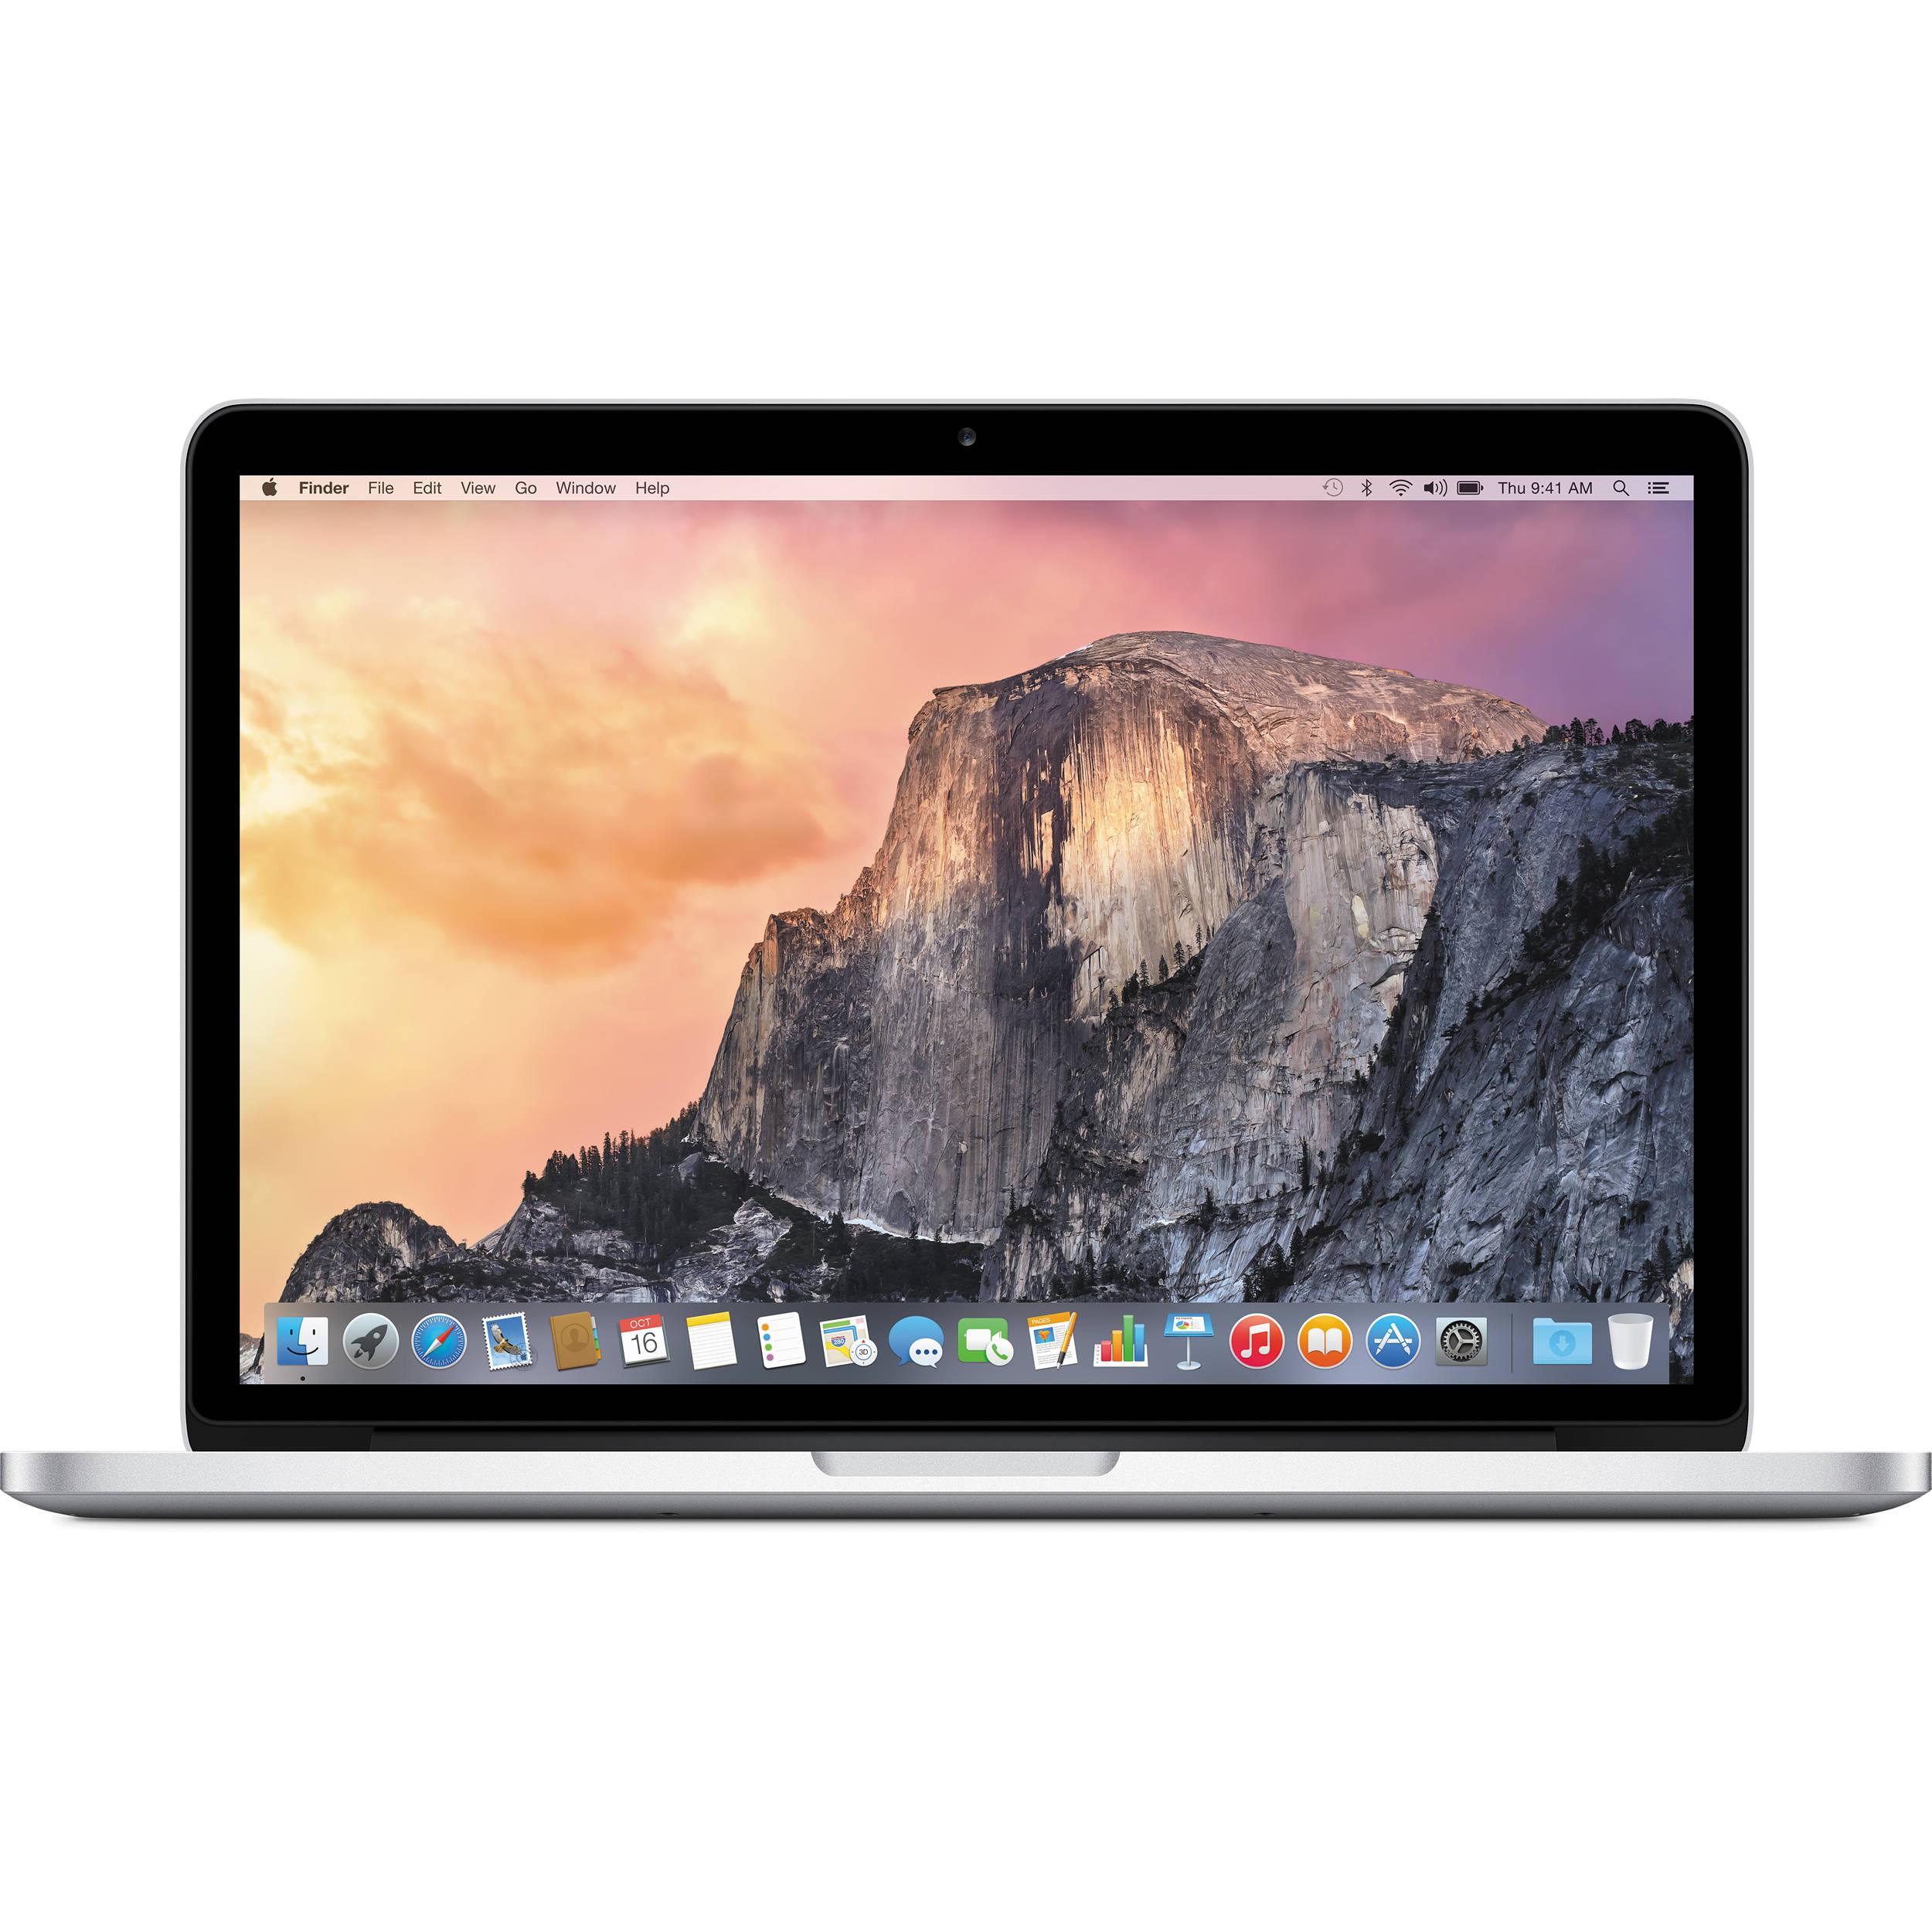 Apple Mfll A Macbook